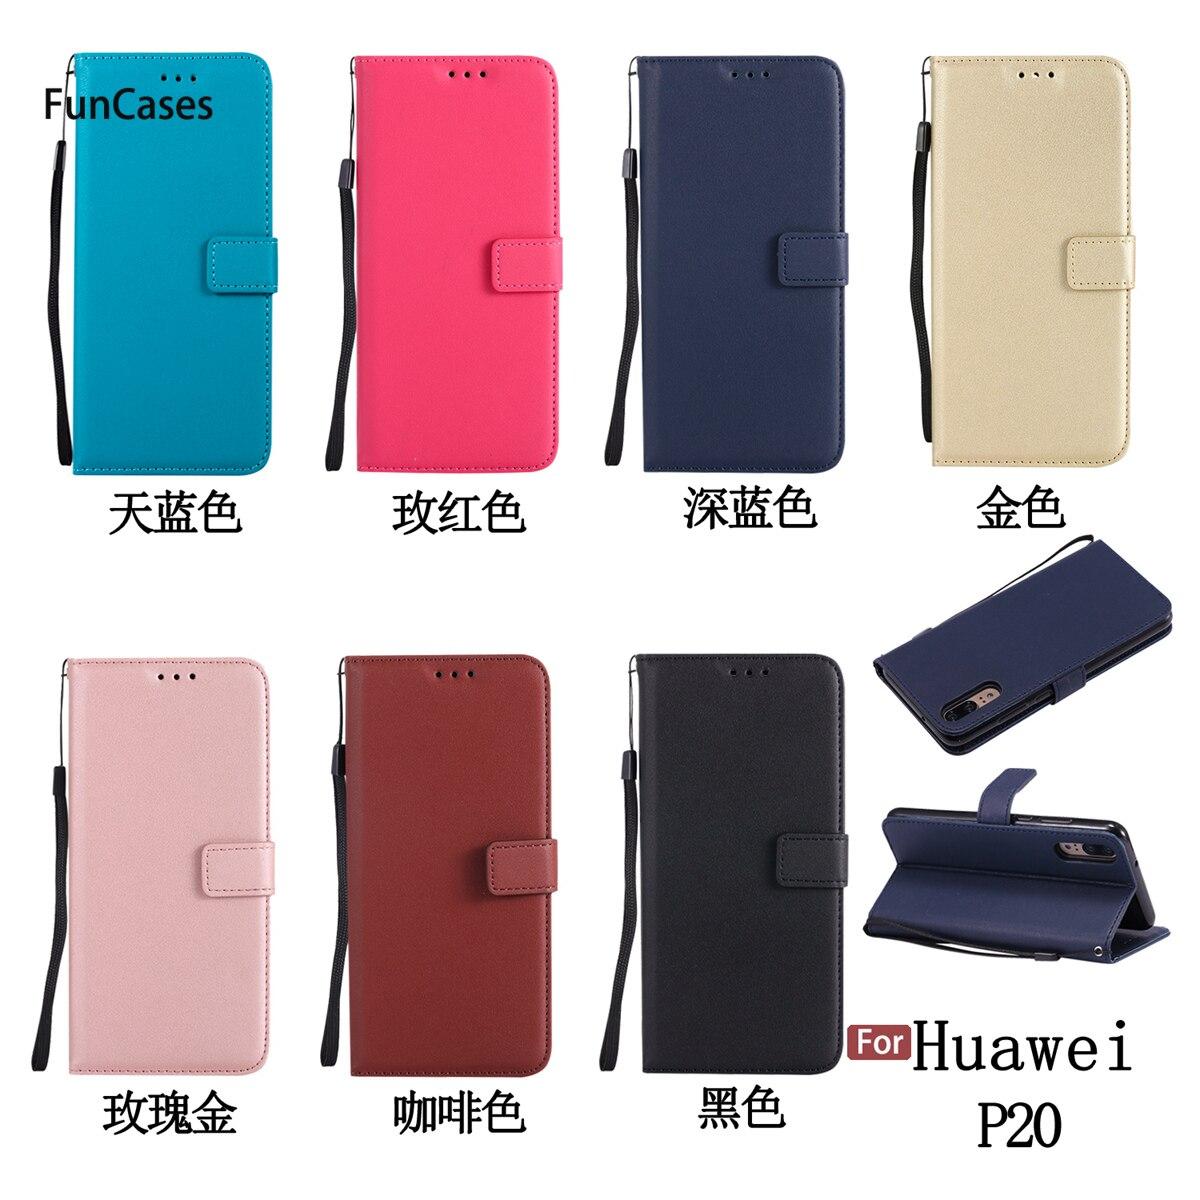 Newest PU Leather <font><b>Case</b></font> sFor Ajax Huawei P20 Bracket <font><b>Case</b></font> Wonderful Squishy Back Cover For Huawei Ascend P20 Plastic Funda Pho Ne